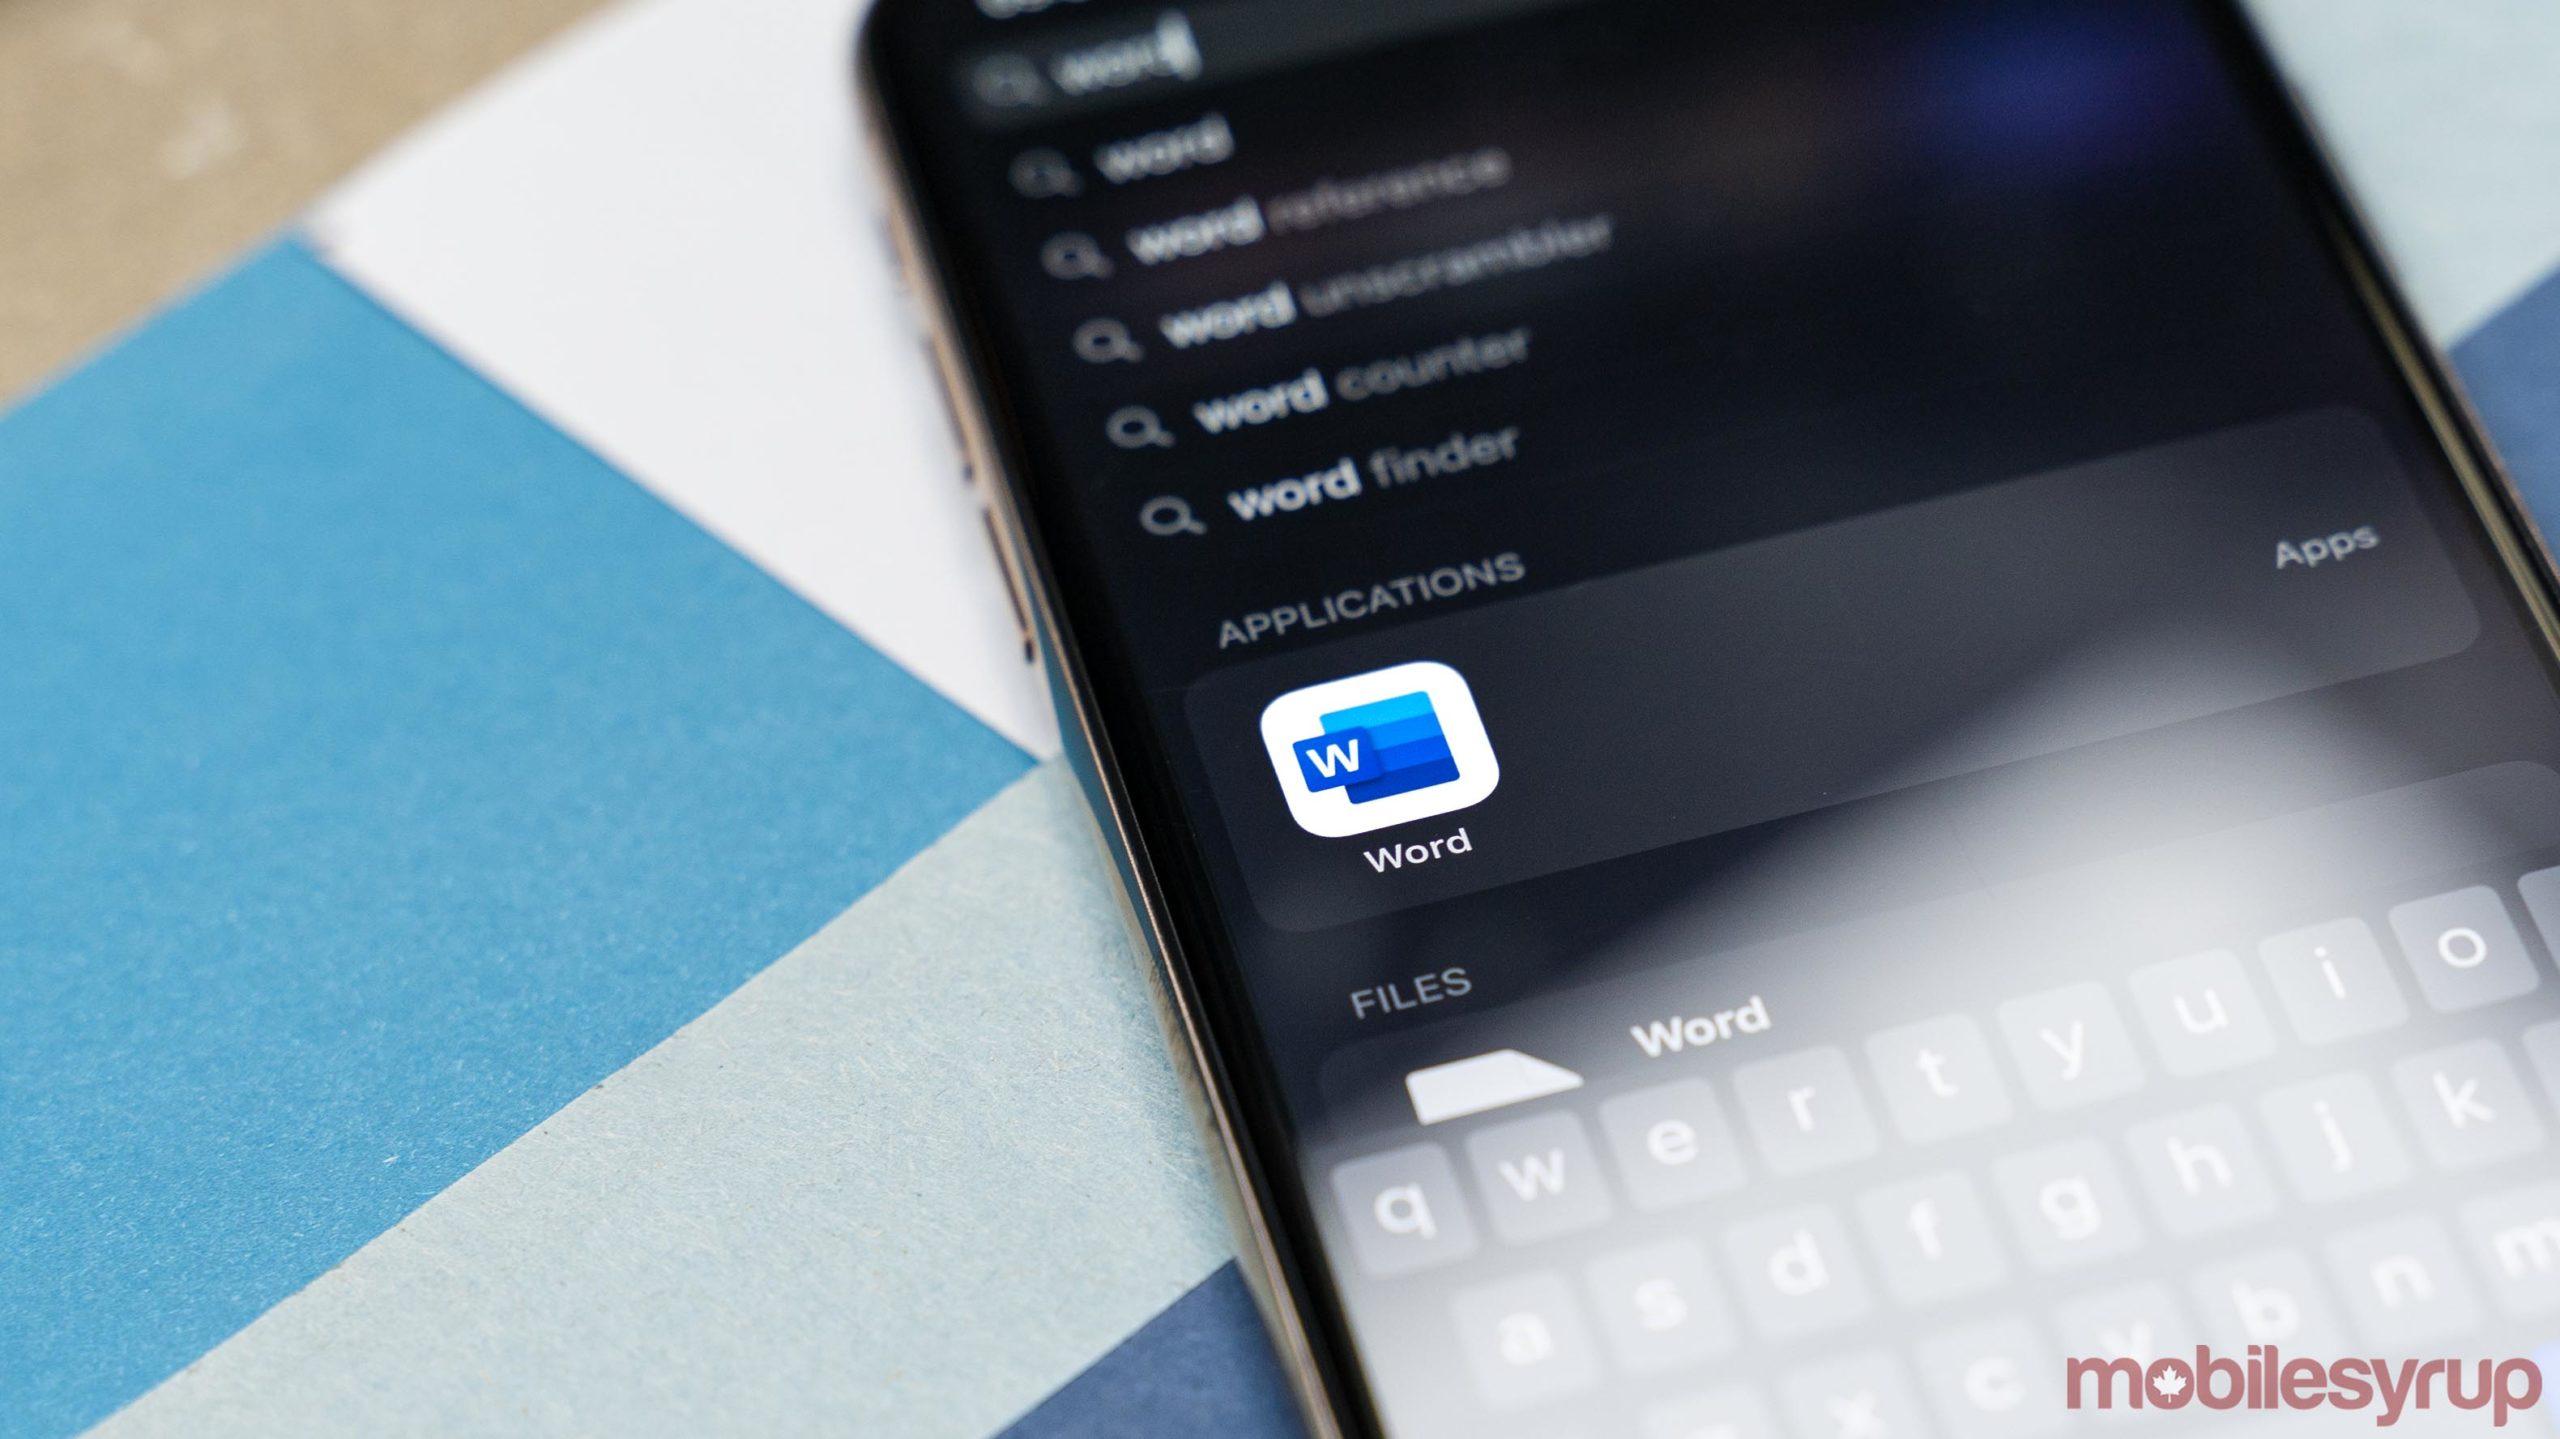 Microsoft Word app on iOS